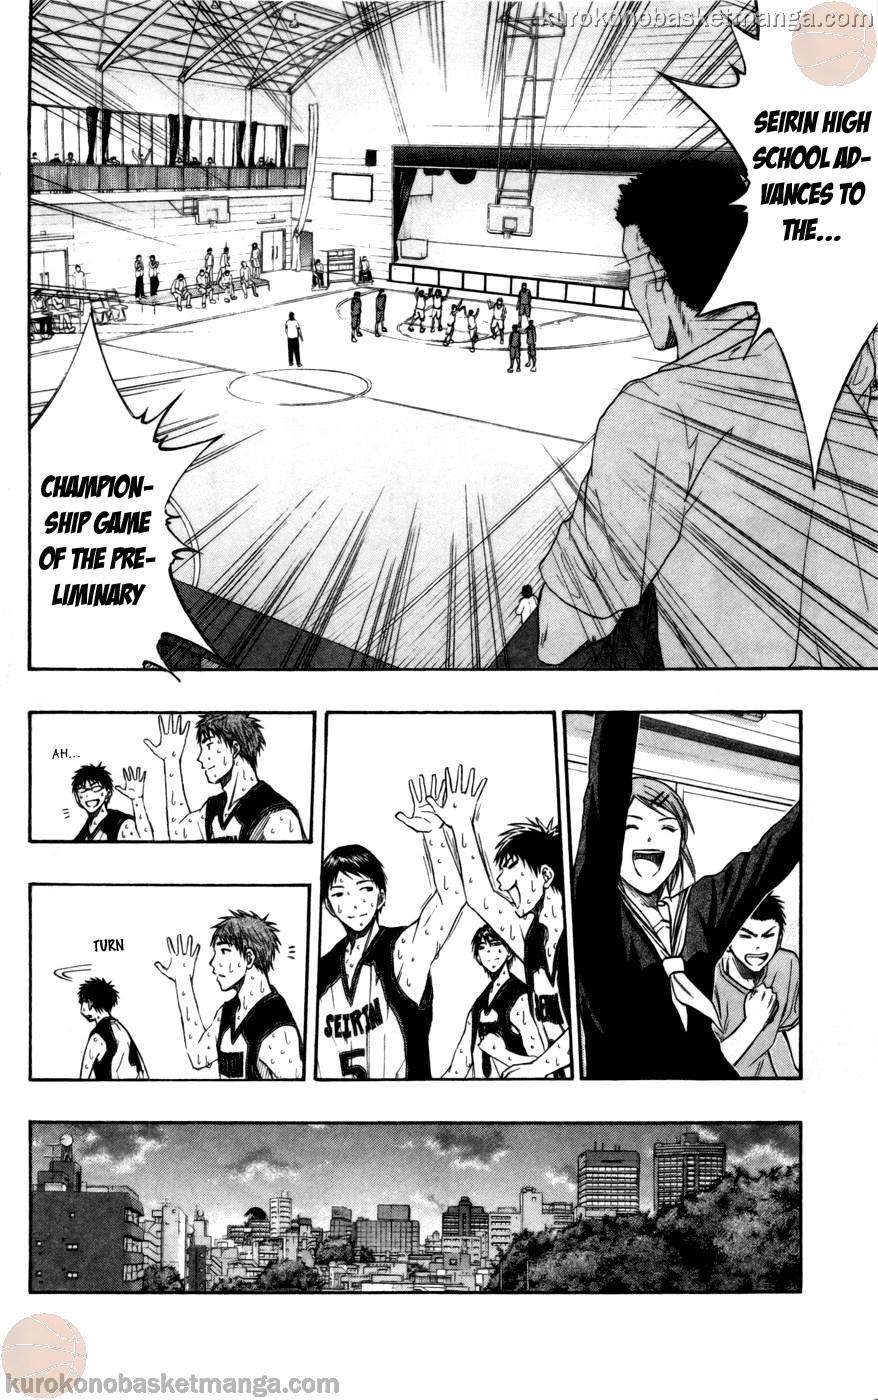 Kuroko no Basket Manga Chapter 98 - Image 04